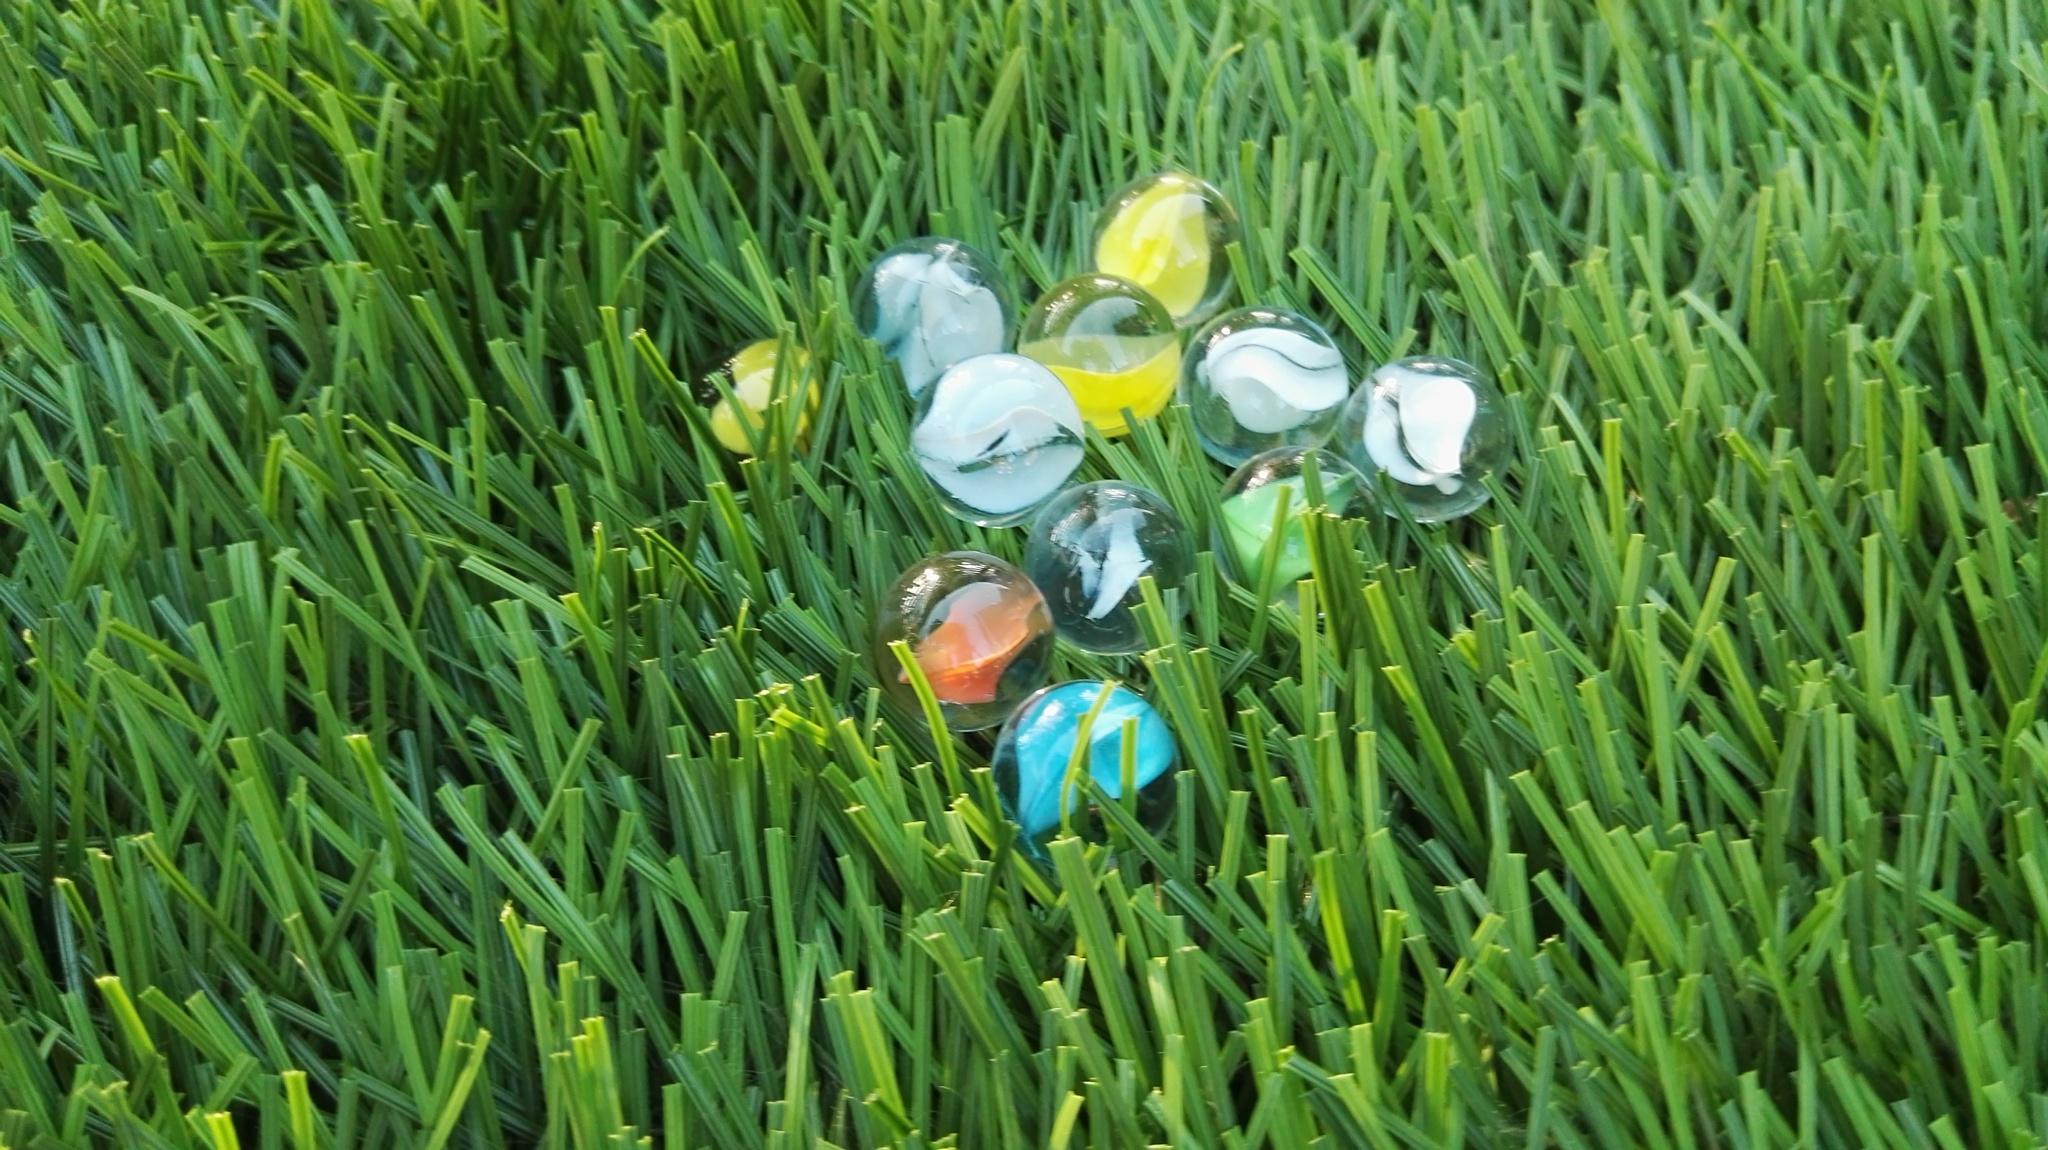 Astro turf Marbles by Lars-Toralf Utnes Storstrand